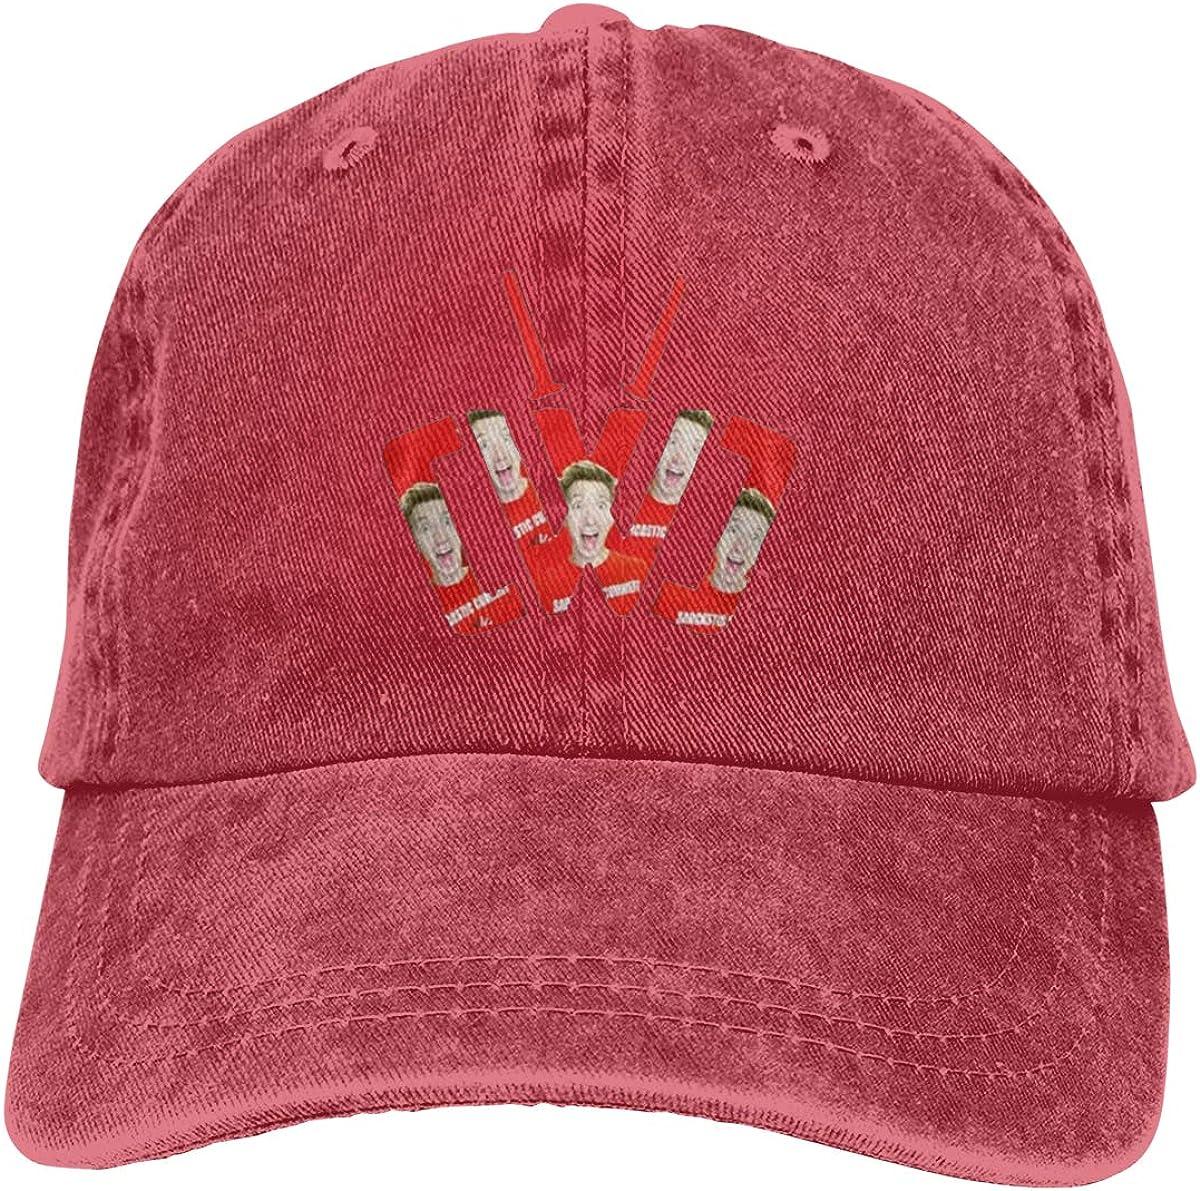 CWC Chad Wild Clay Adjustable Denim Hats